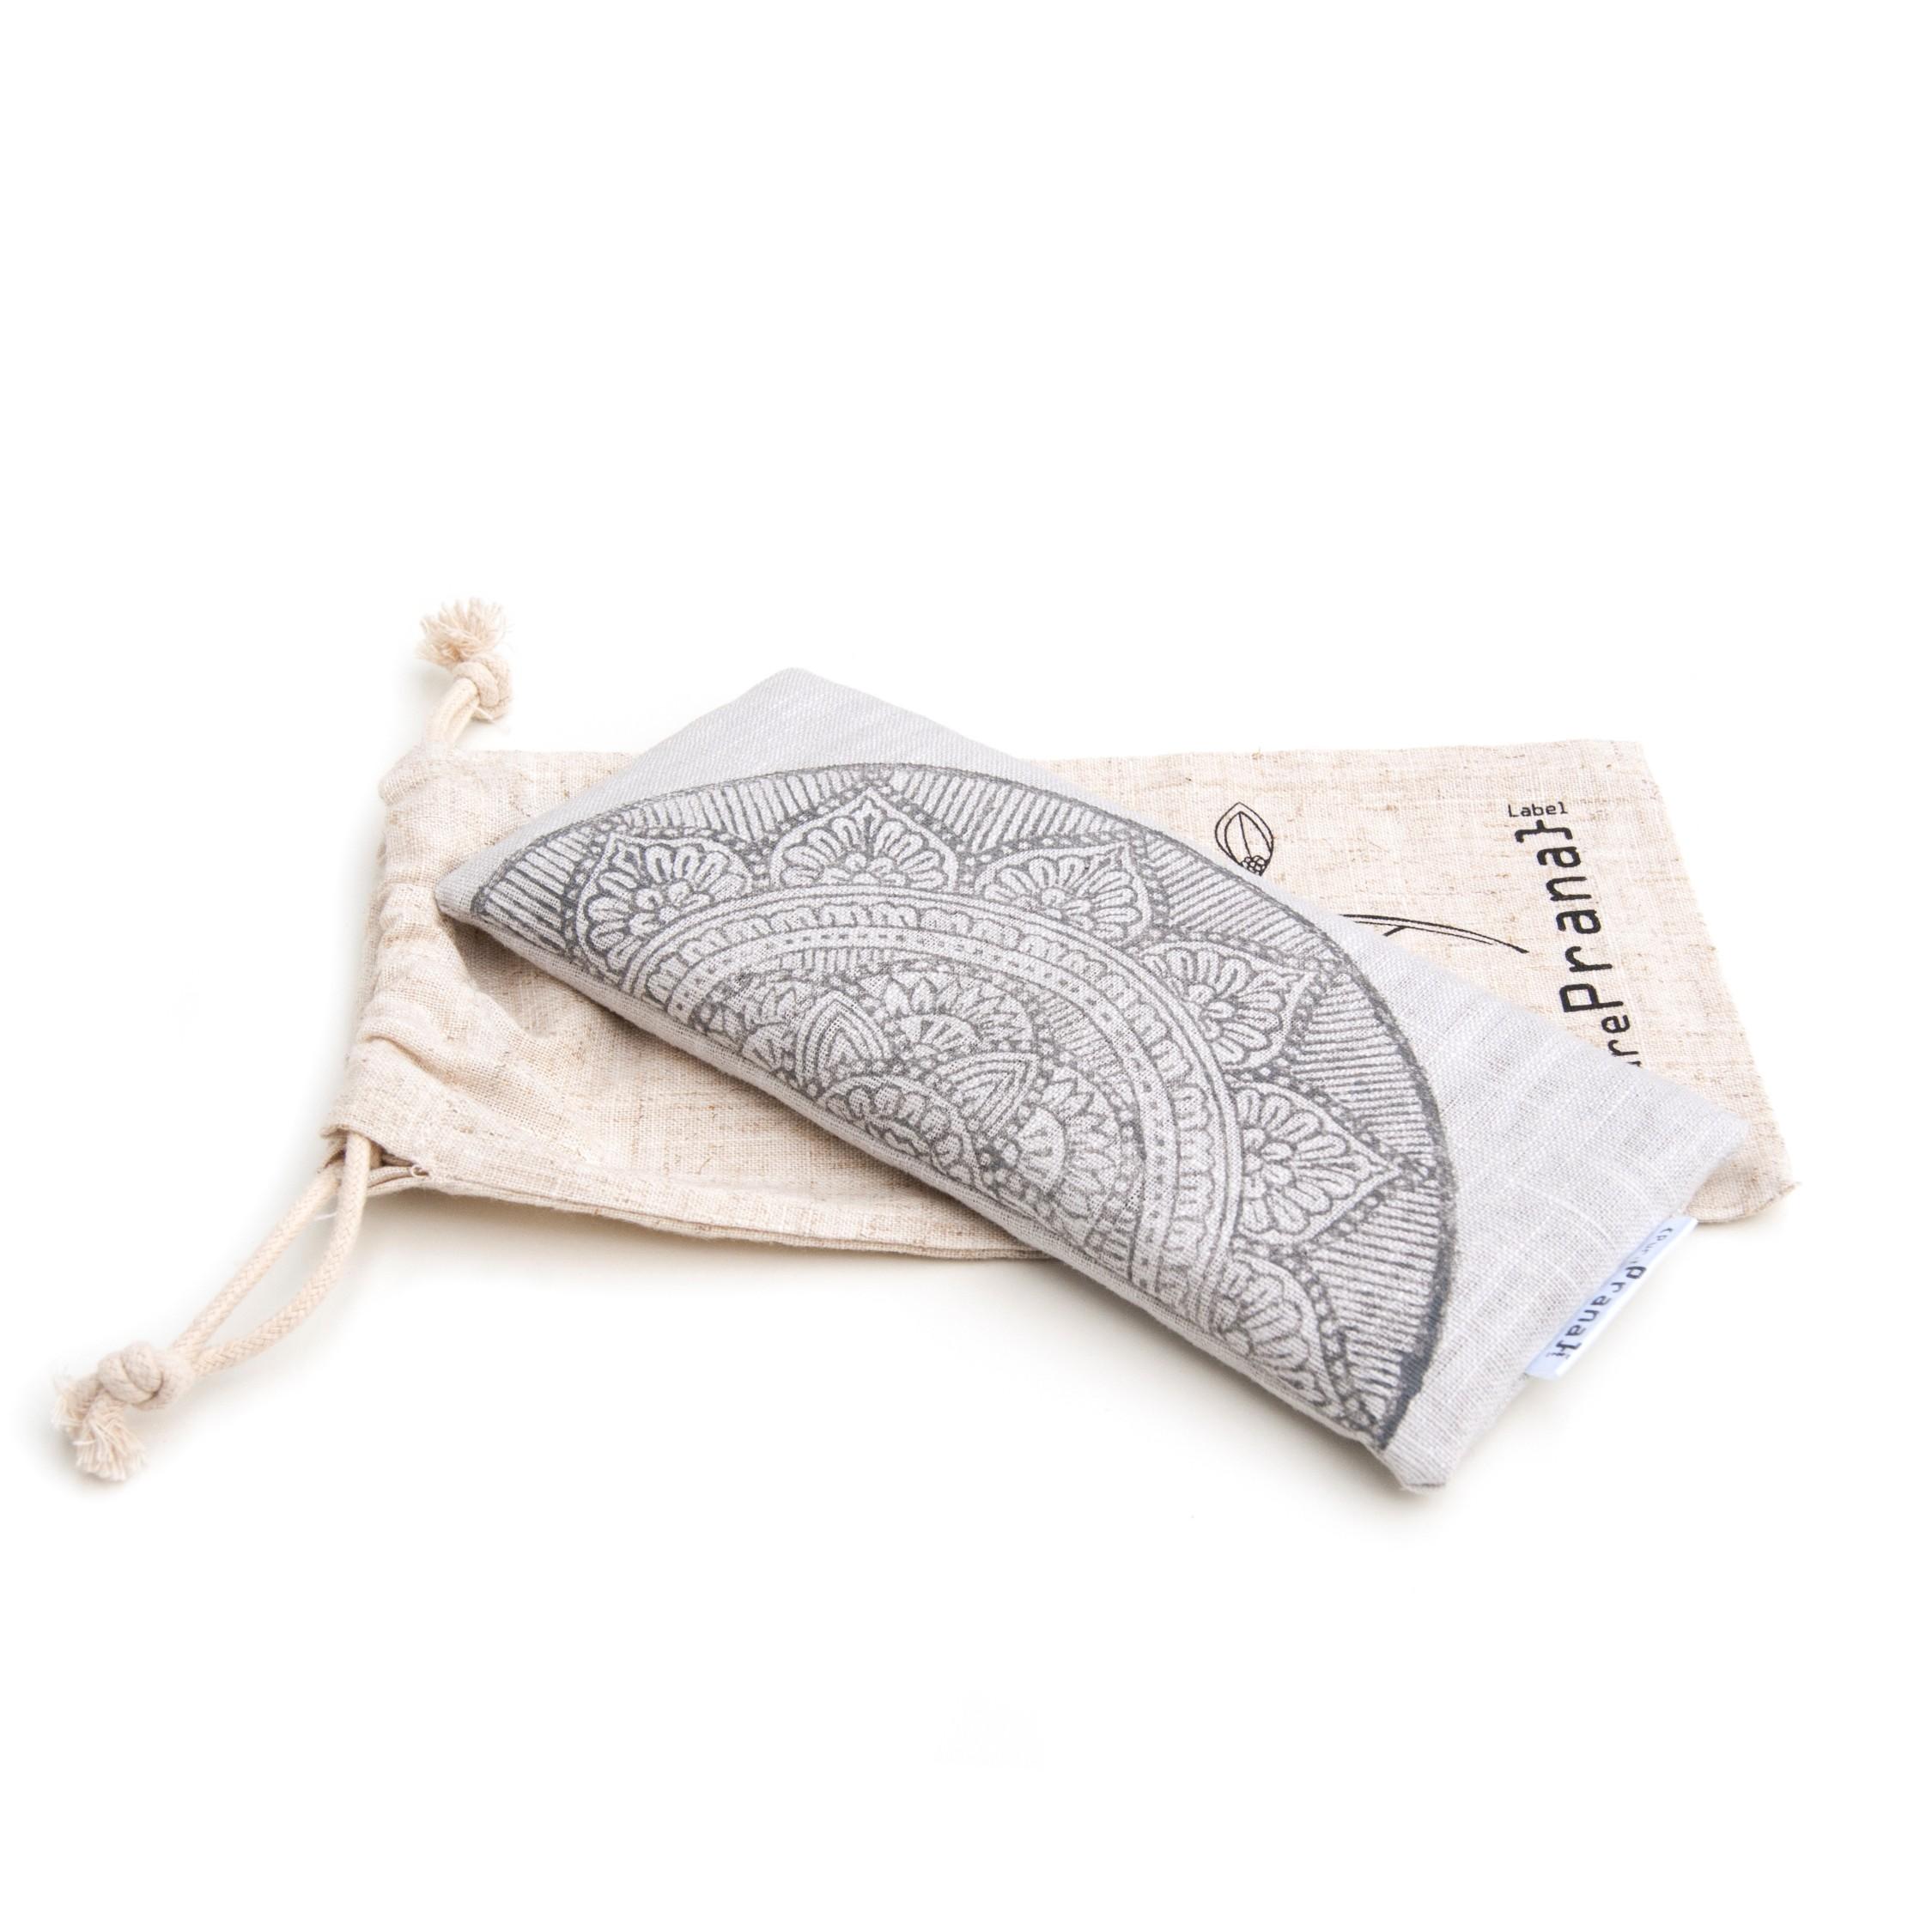 Mandala eye pillow Ligh gray by Pure Prana Label